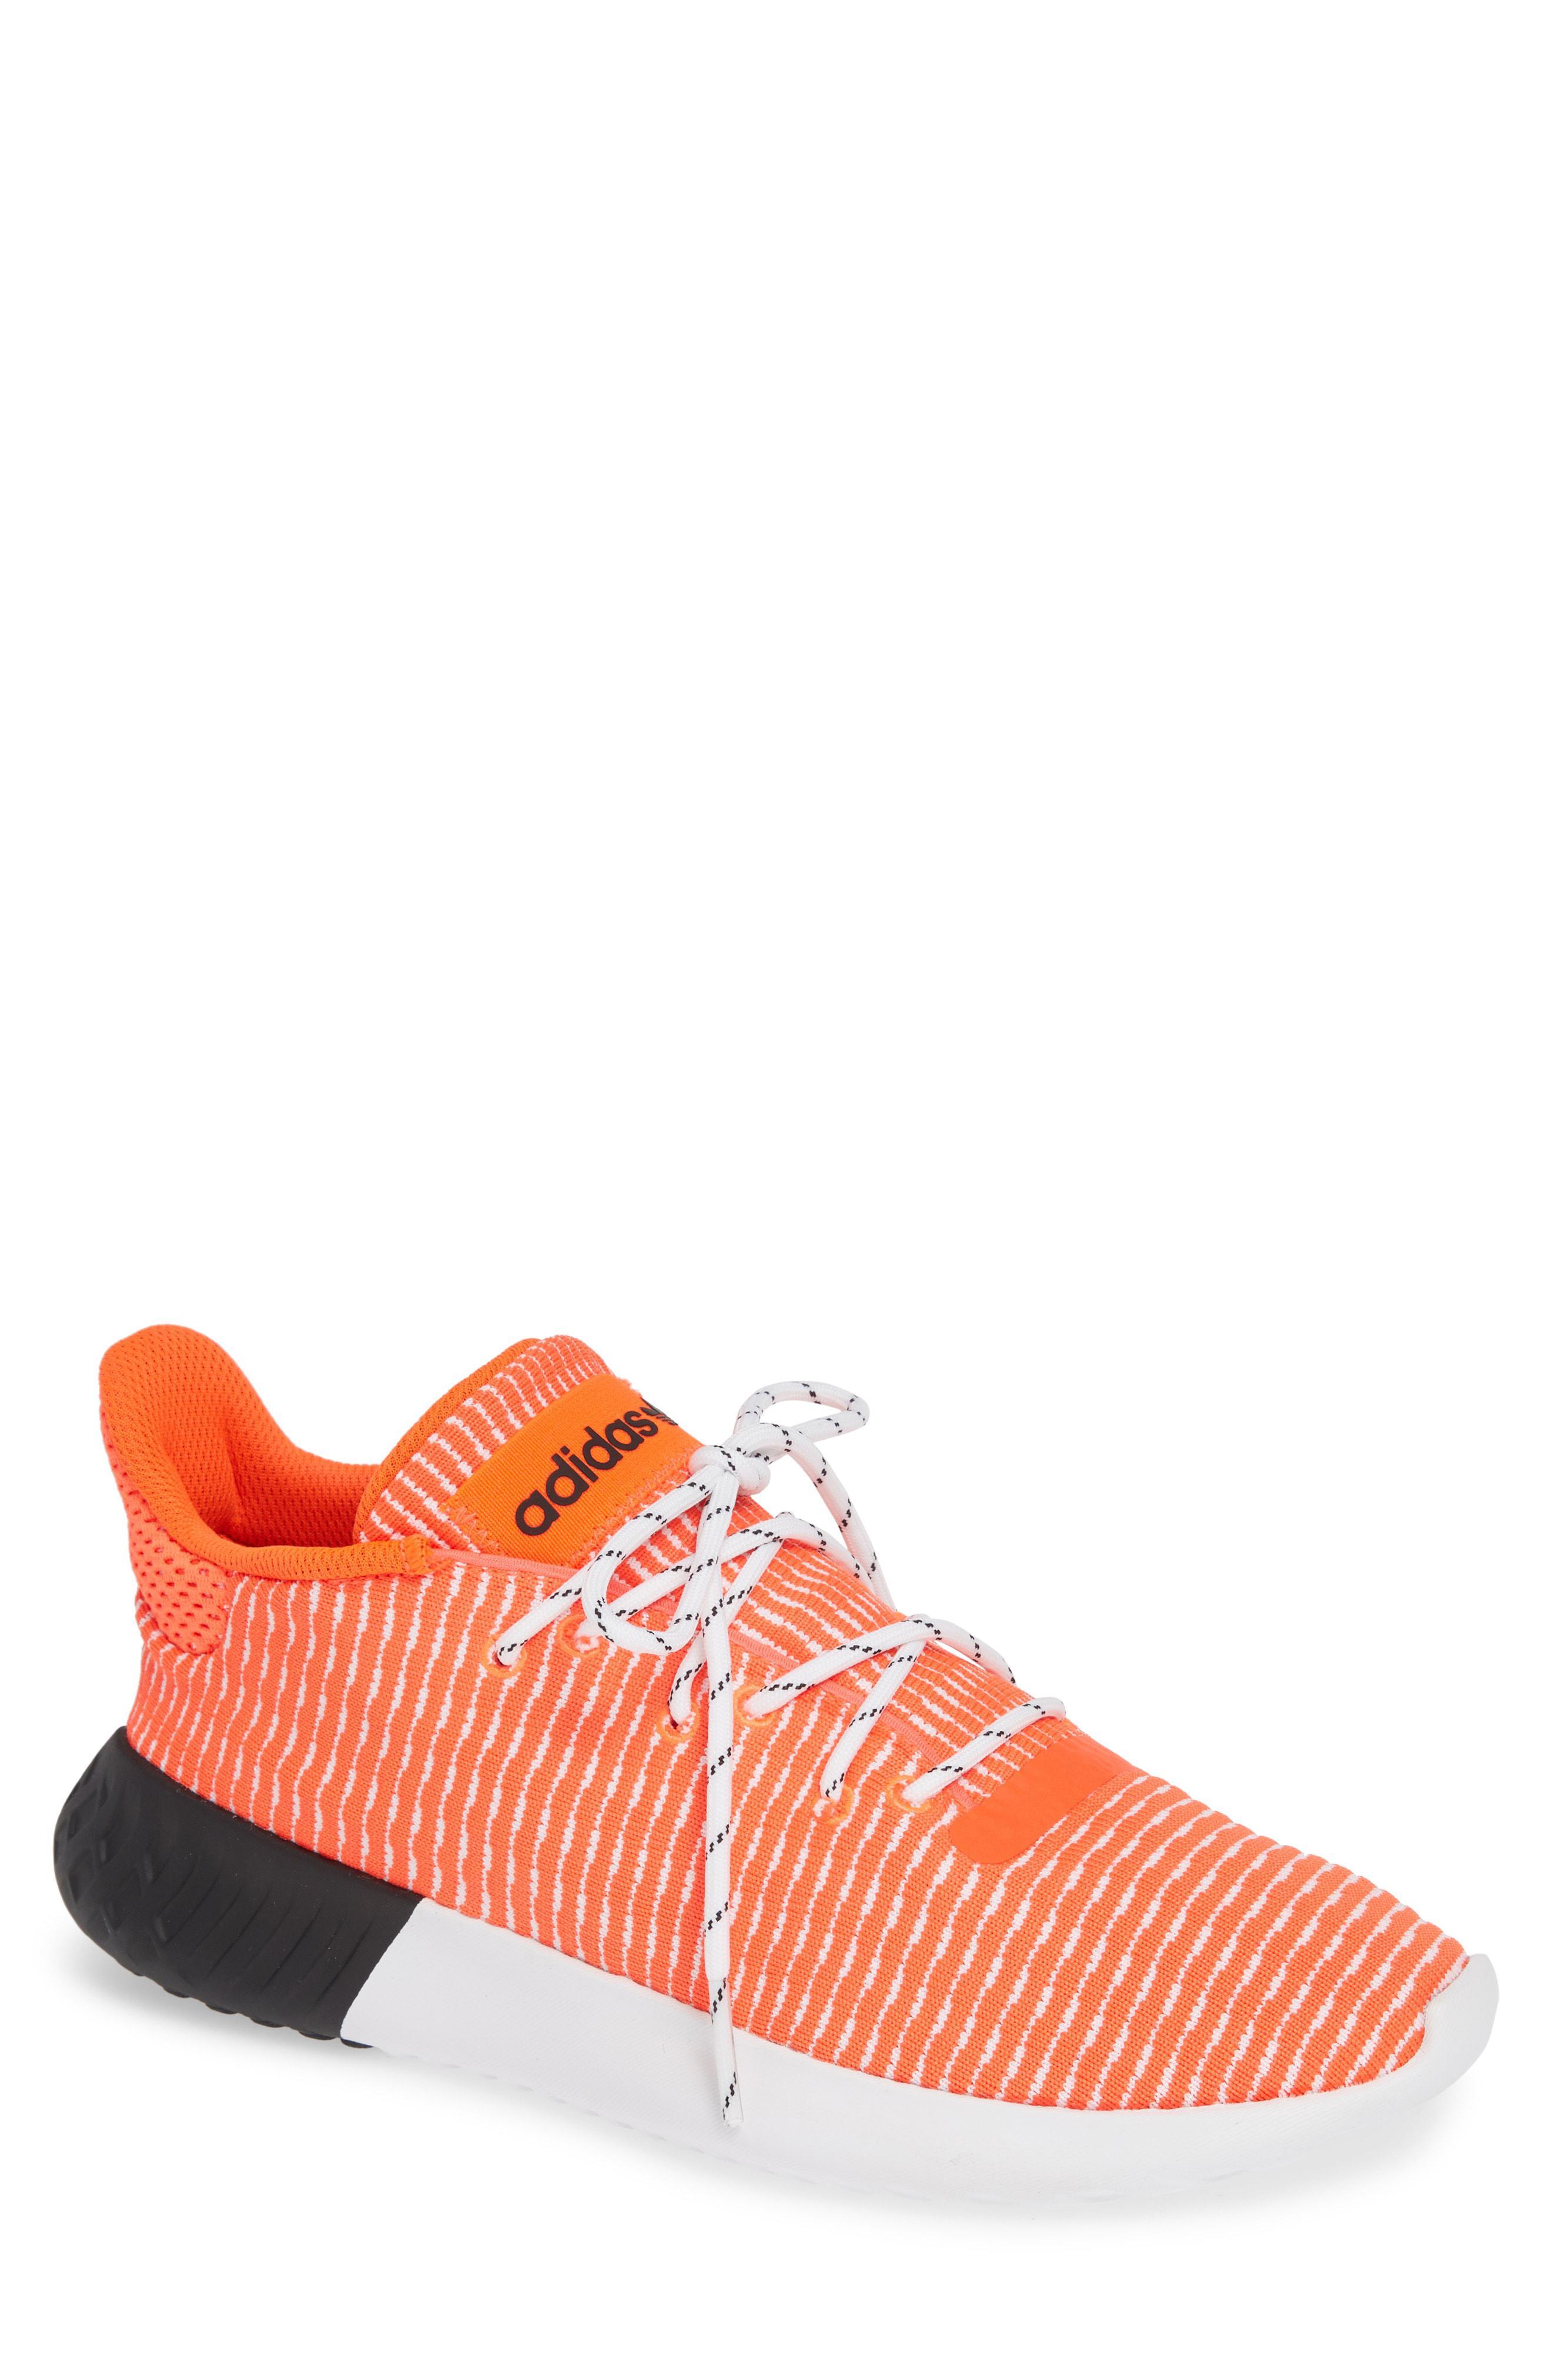 ae55ba19ea78 Adidas - Red Tubular Dusk Primeknit Sneaker for Men - Lyst. View fullscreen